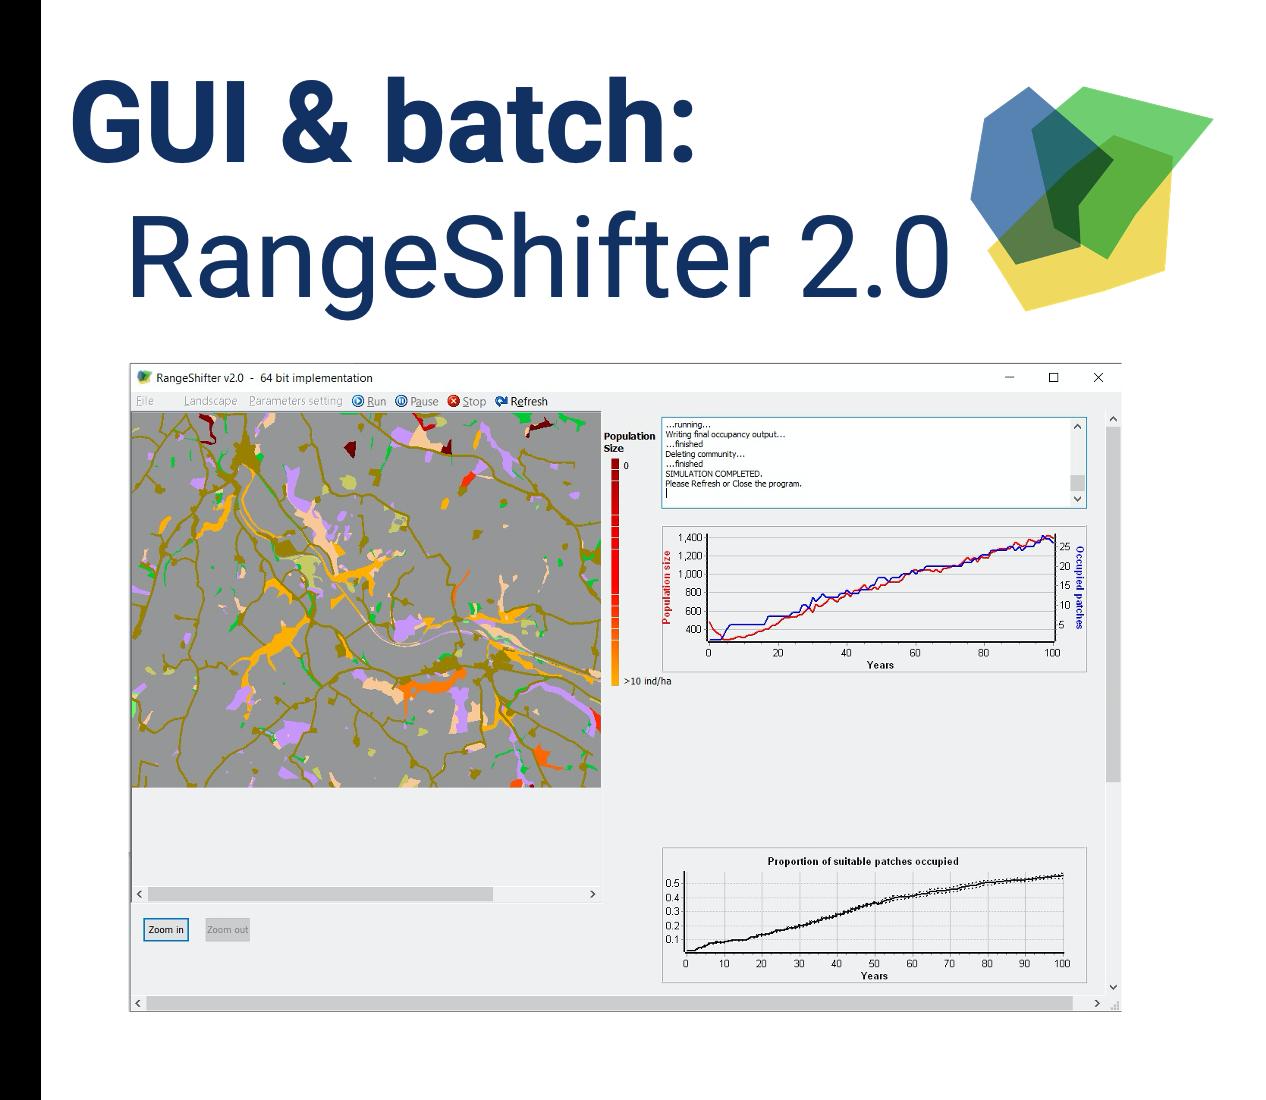 RangeShifter 2.0